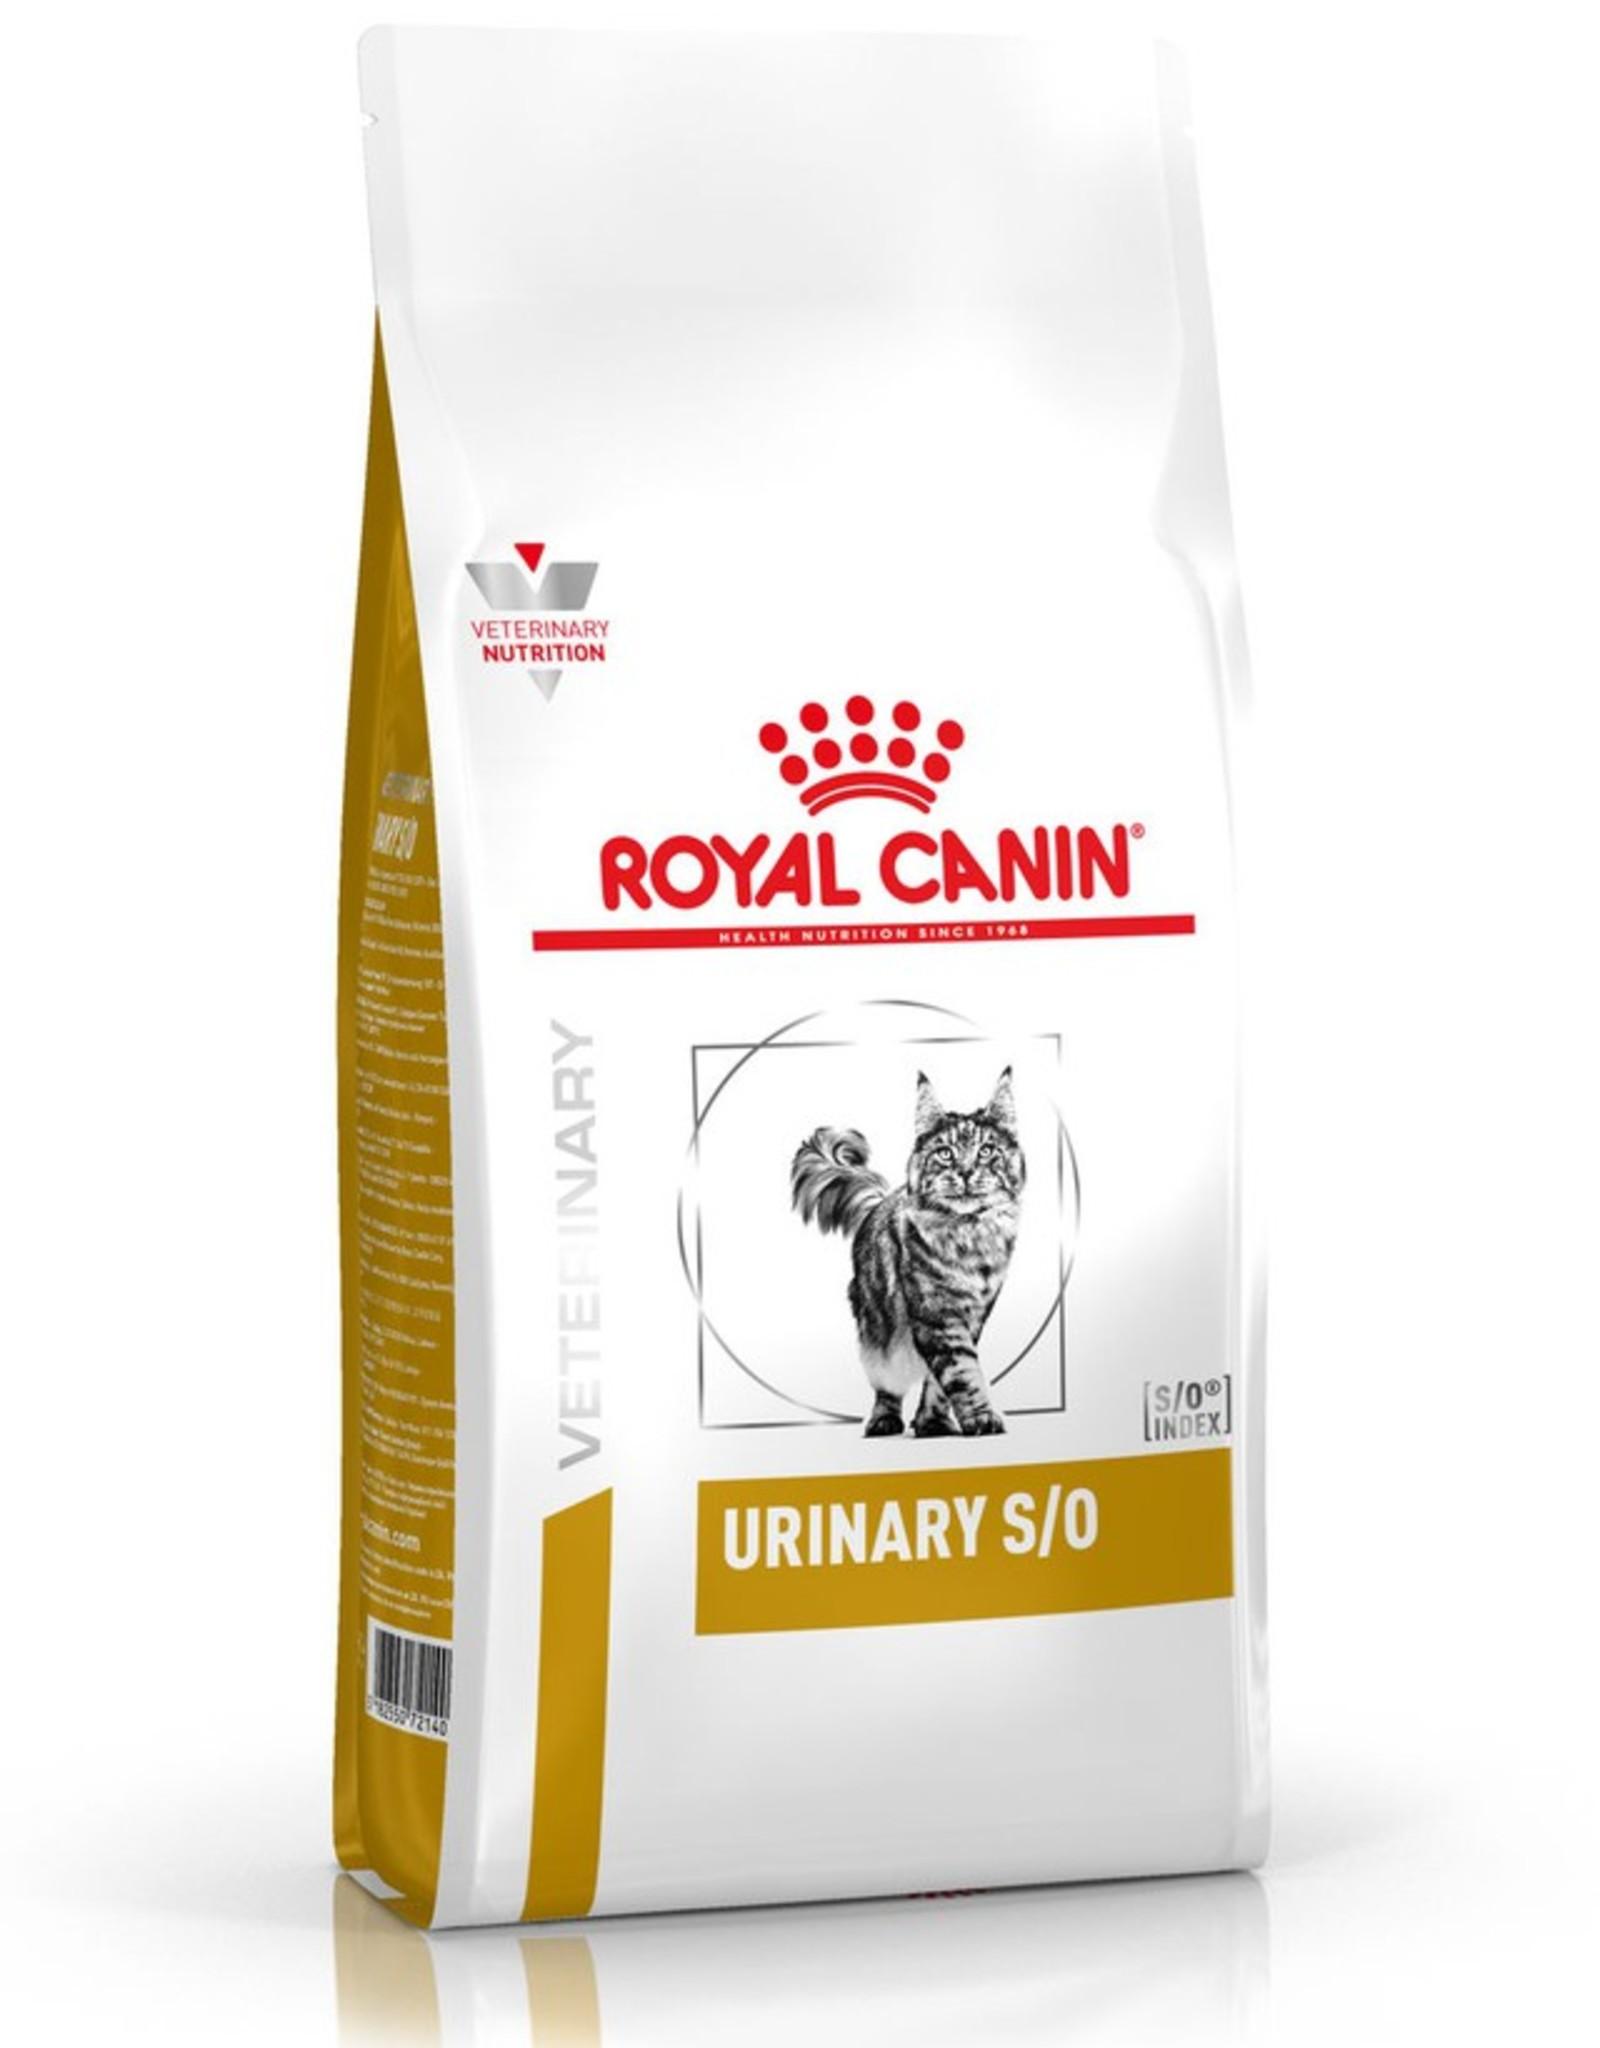 Royal Canin Royal Canin Urinary S/o Cat 7kg